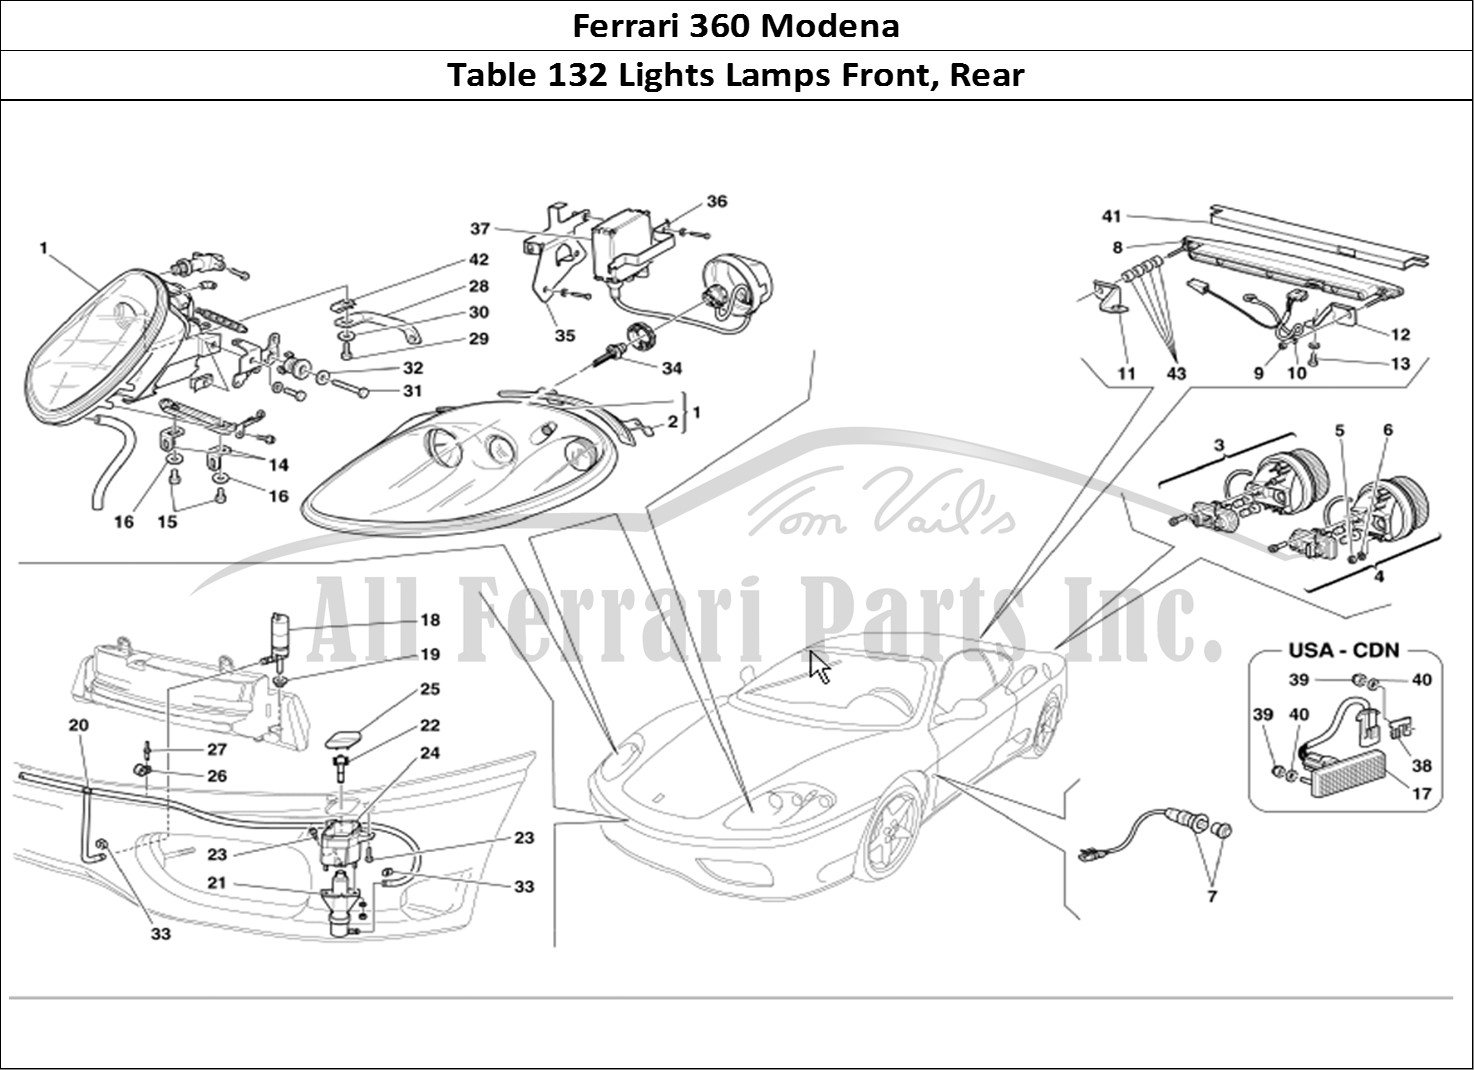 Buy Original Ferrari 360 Modena 132 Lights Lamps Front